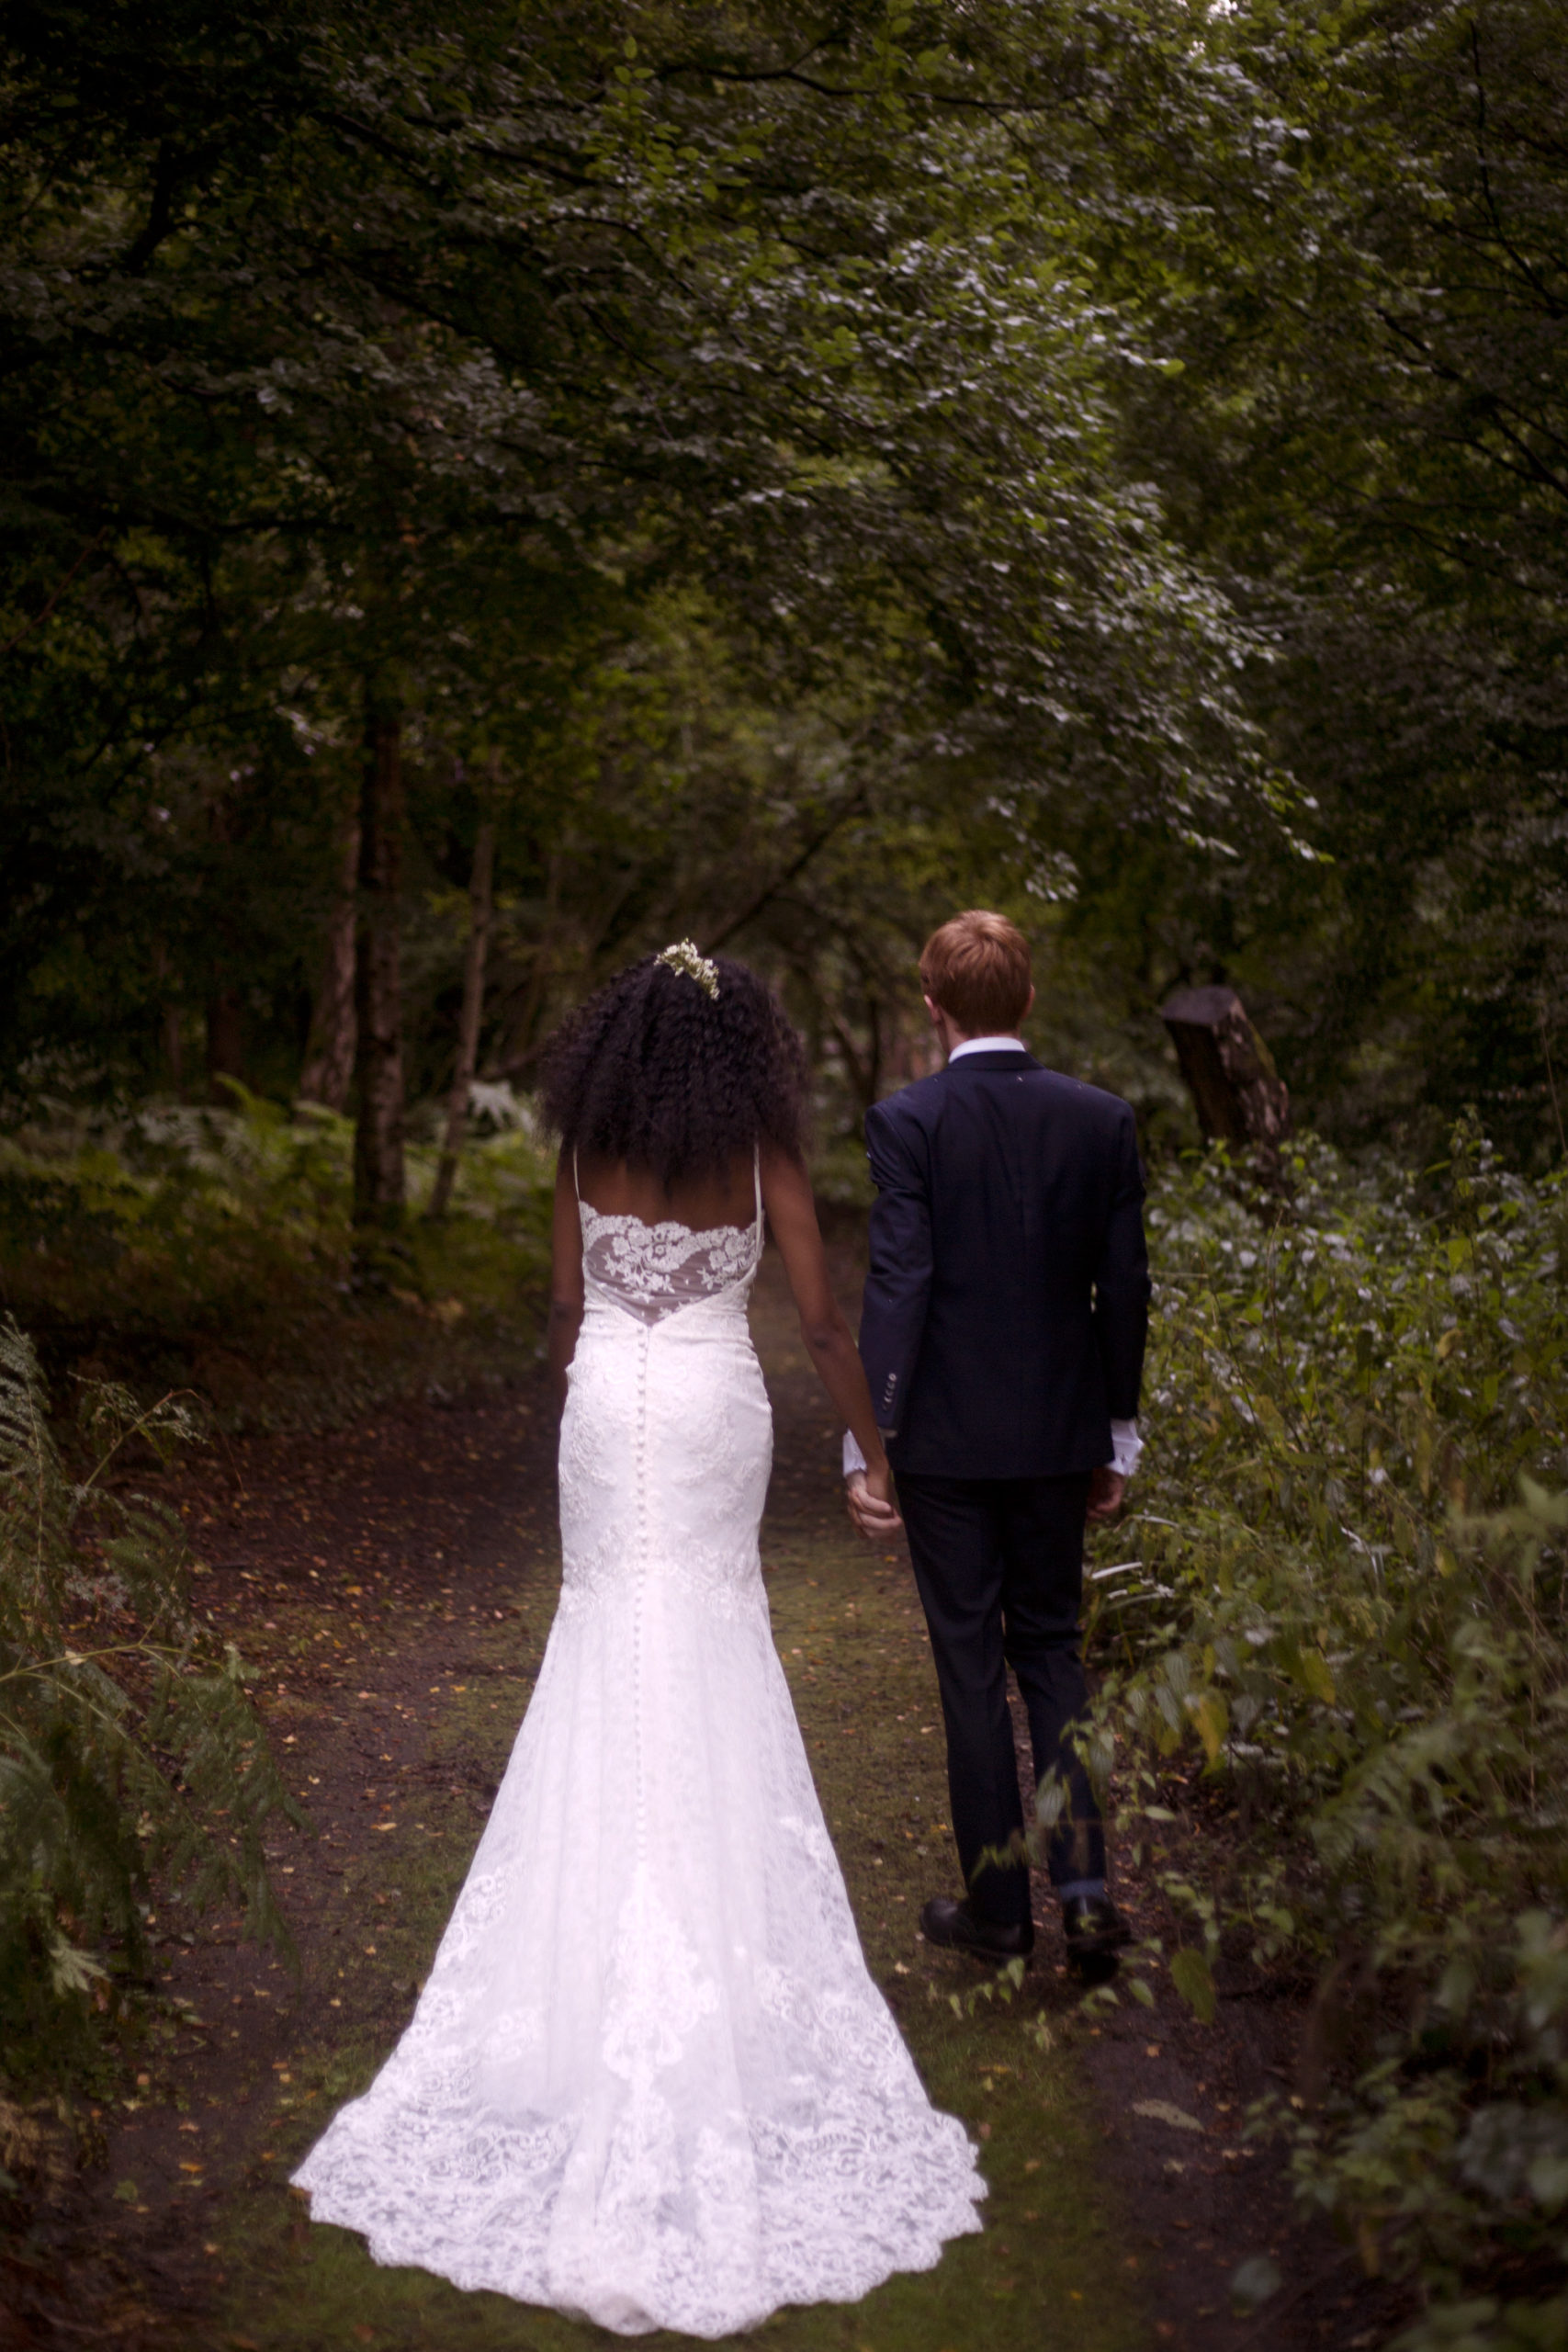 Bride in Essence of Australia wedding dress at Cuffley camp outdoor woodland wedding photographer